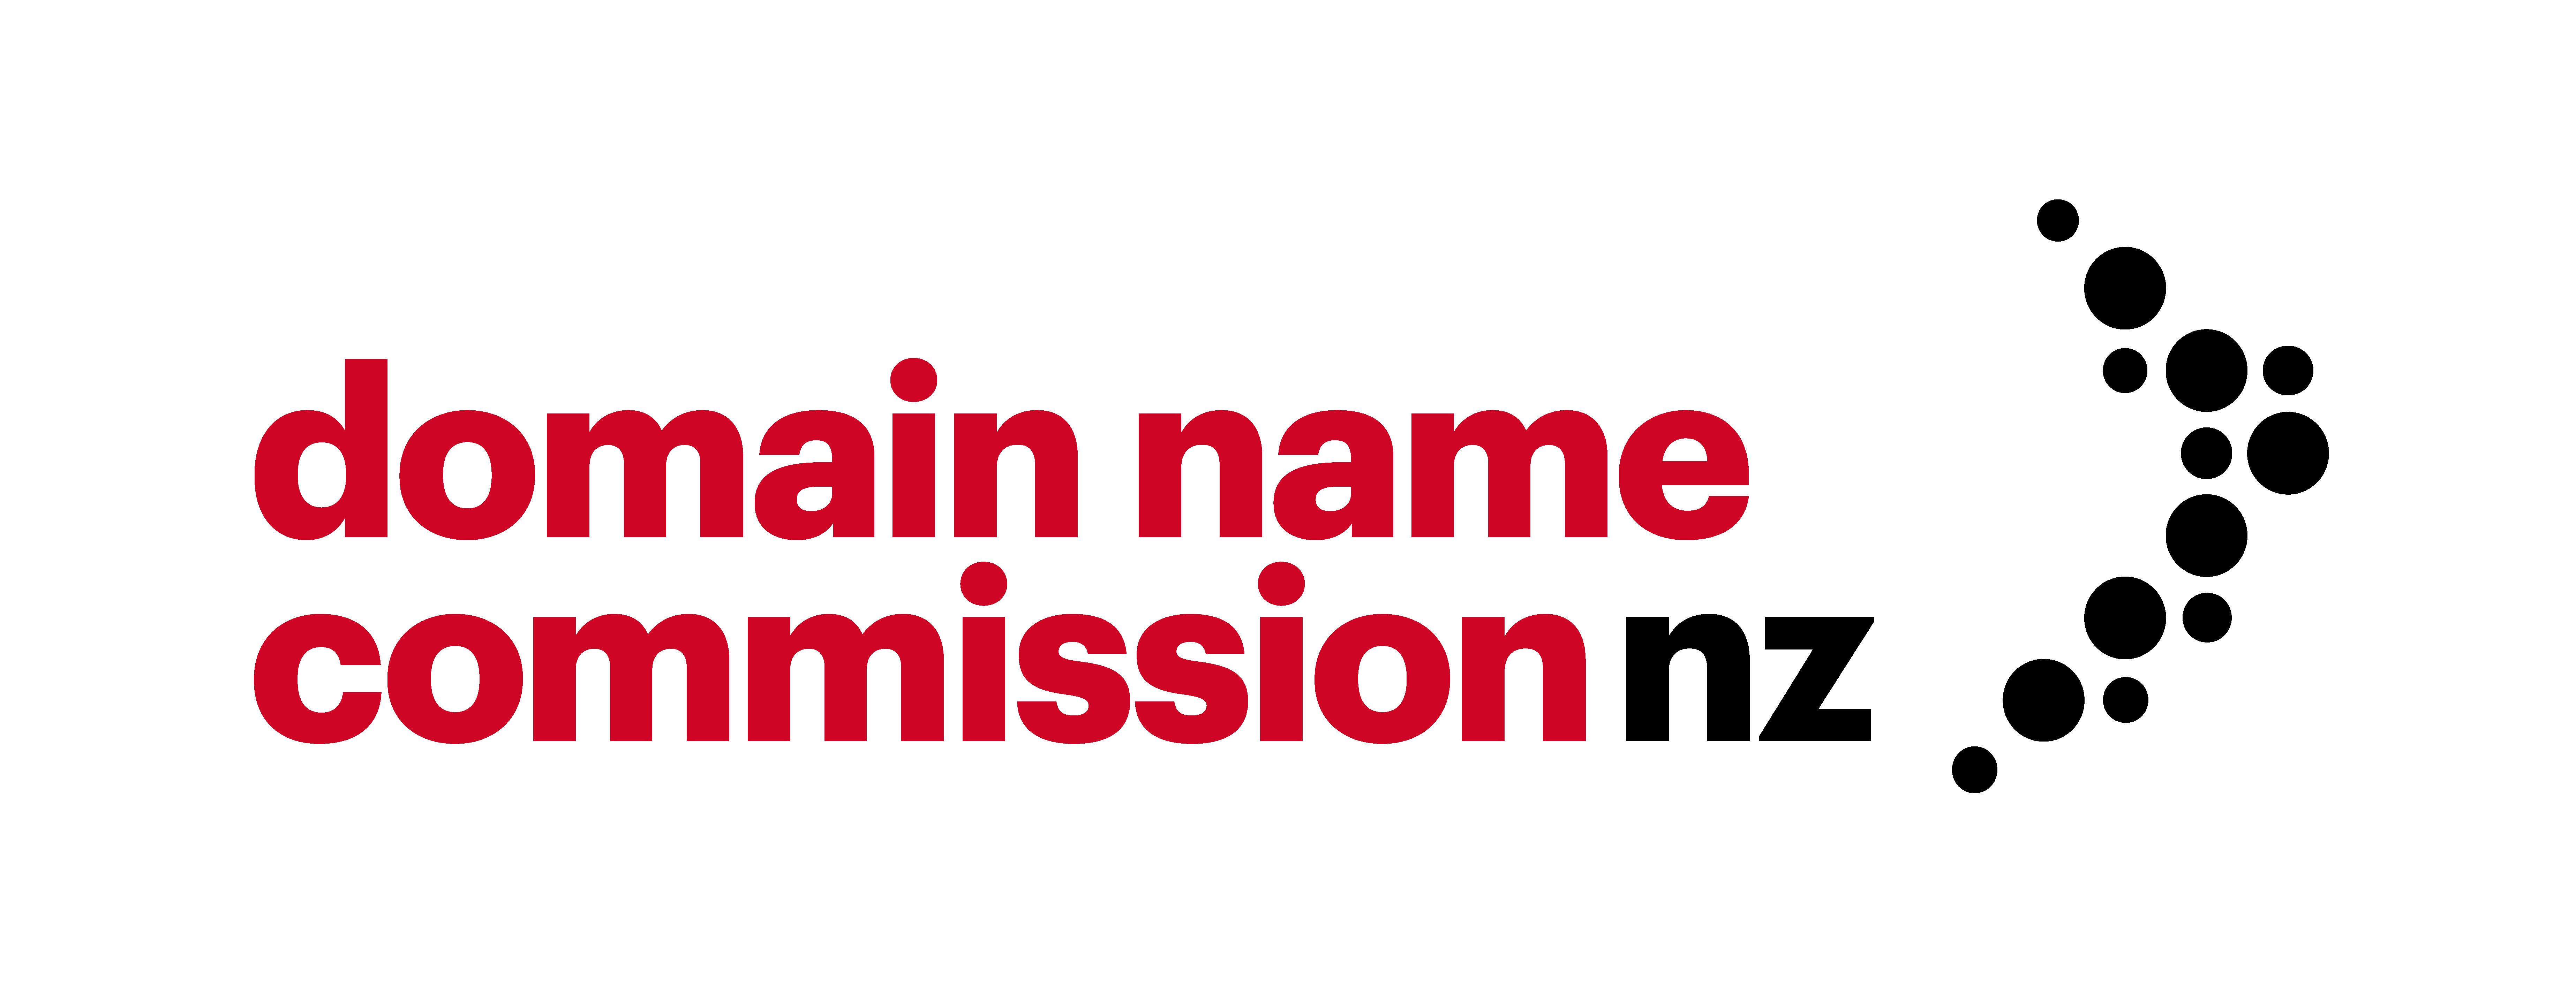 Dispute Resolution Co-Creation Workshop logo